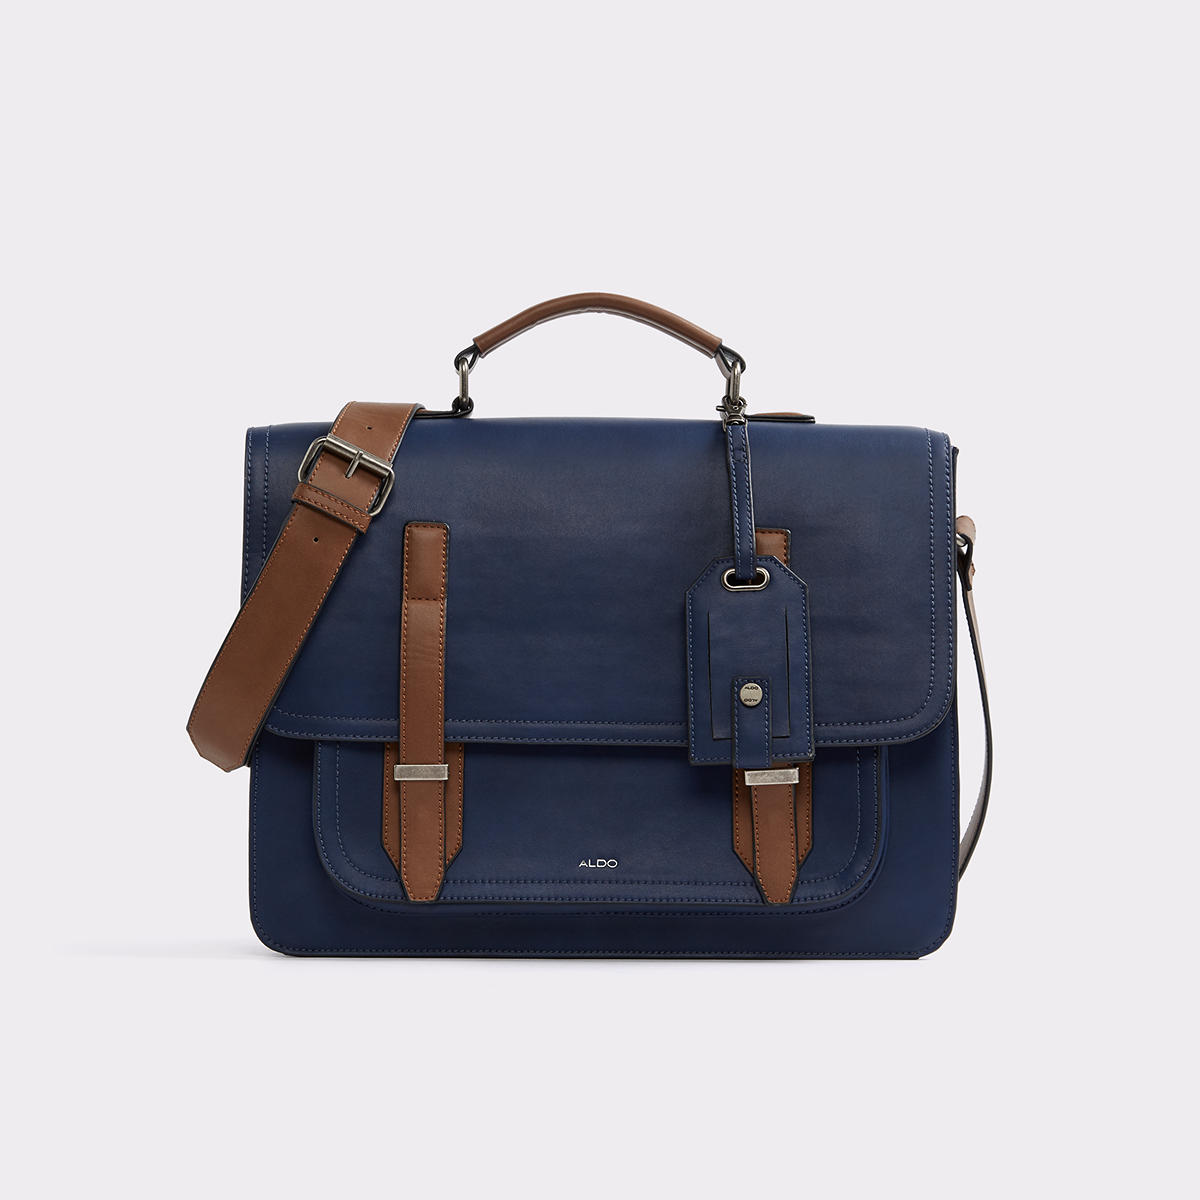 Handbags Aldo Style Guru Fashion Glitz Glamour Style